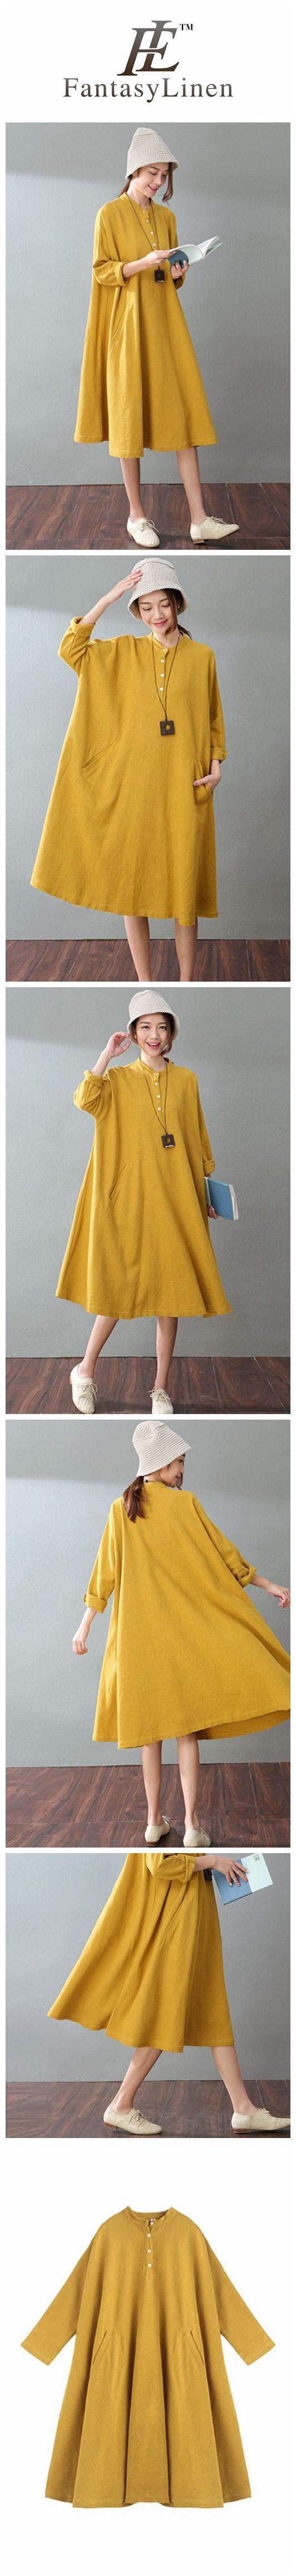 Spring Yellow Casual Cotton Linen Dresses Long Sleeve Shirt Dress Women Clothes  Q1701Yellow